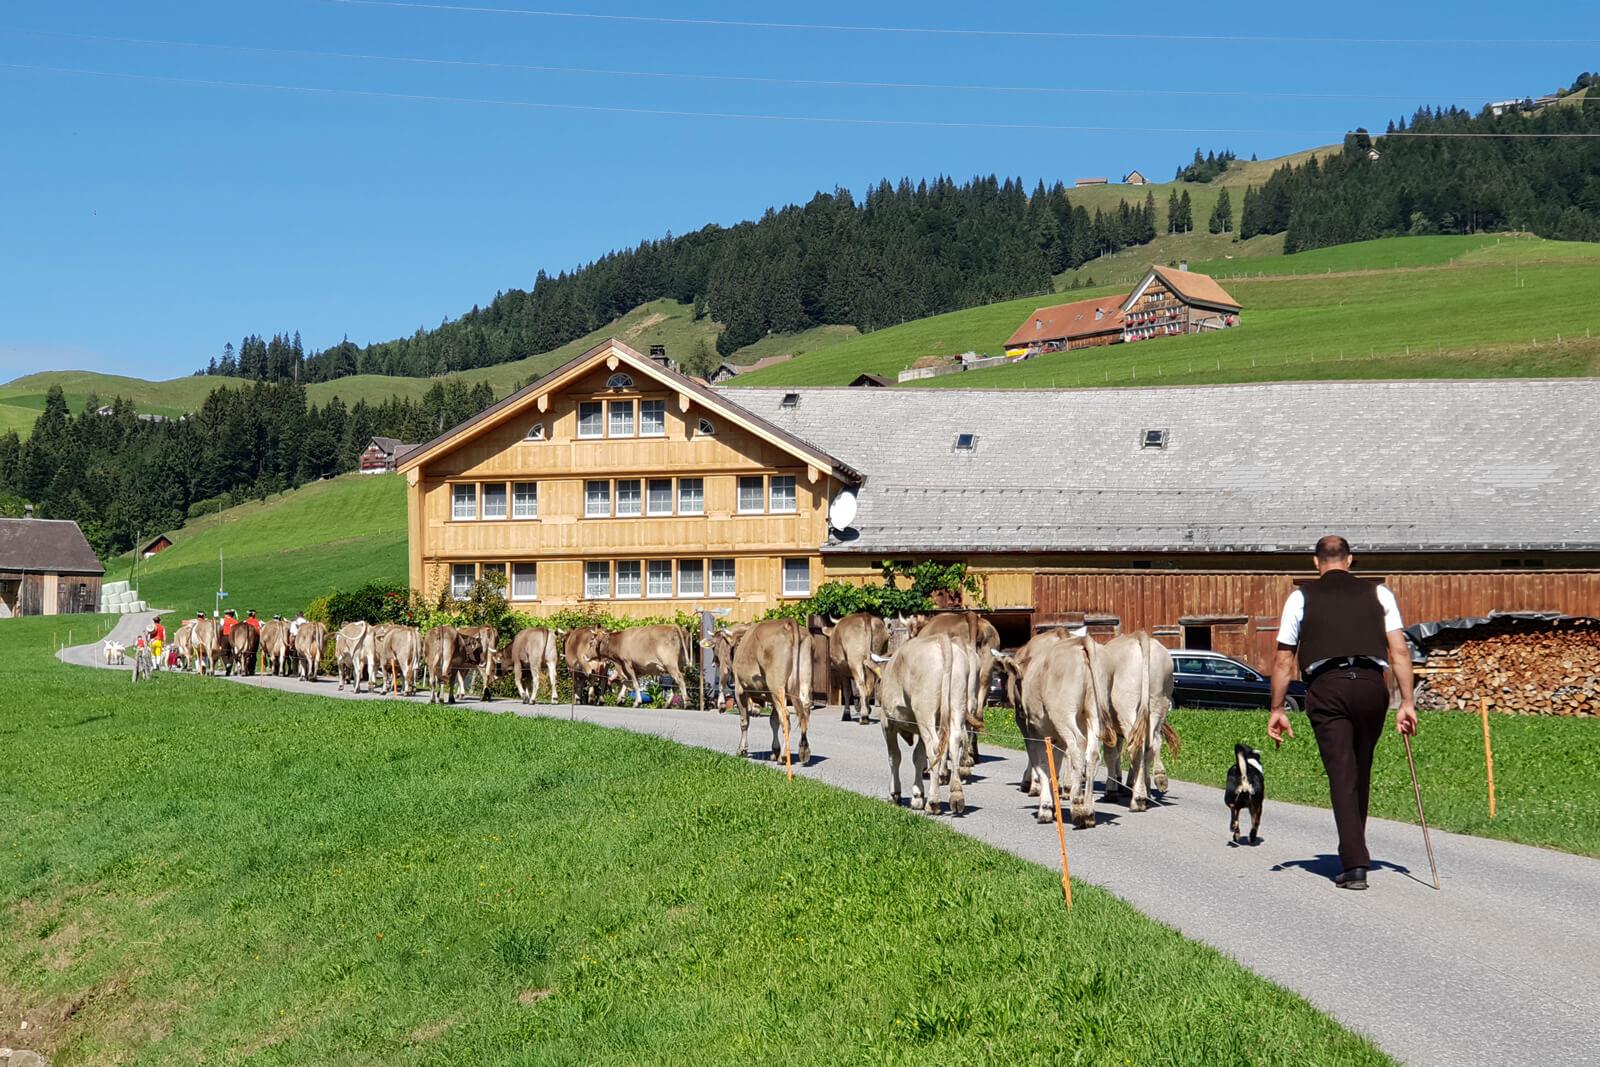 Alpabzug Alpine Cow Parade in Gonten